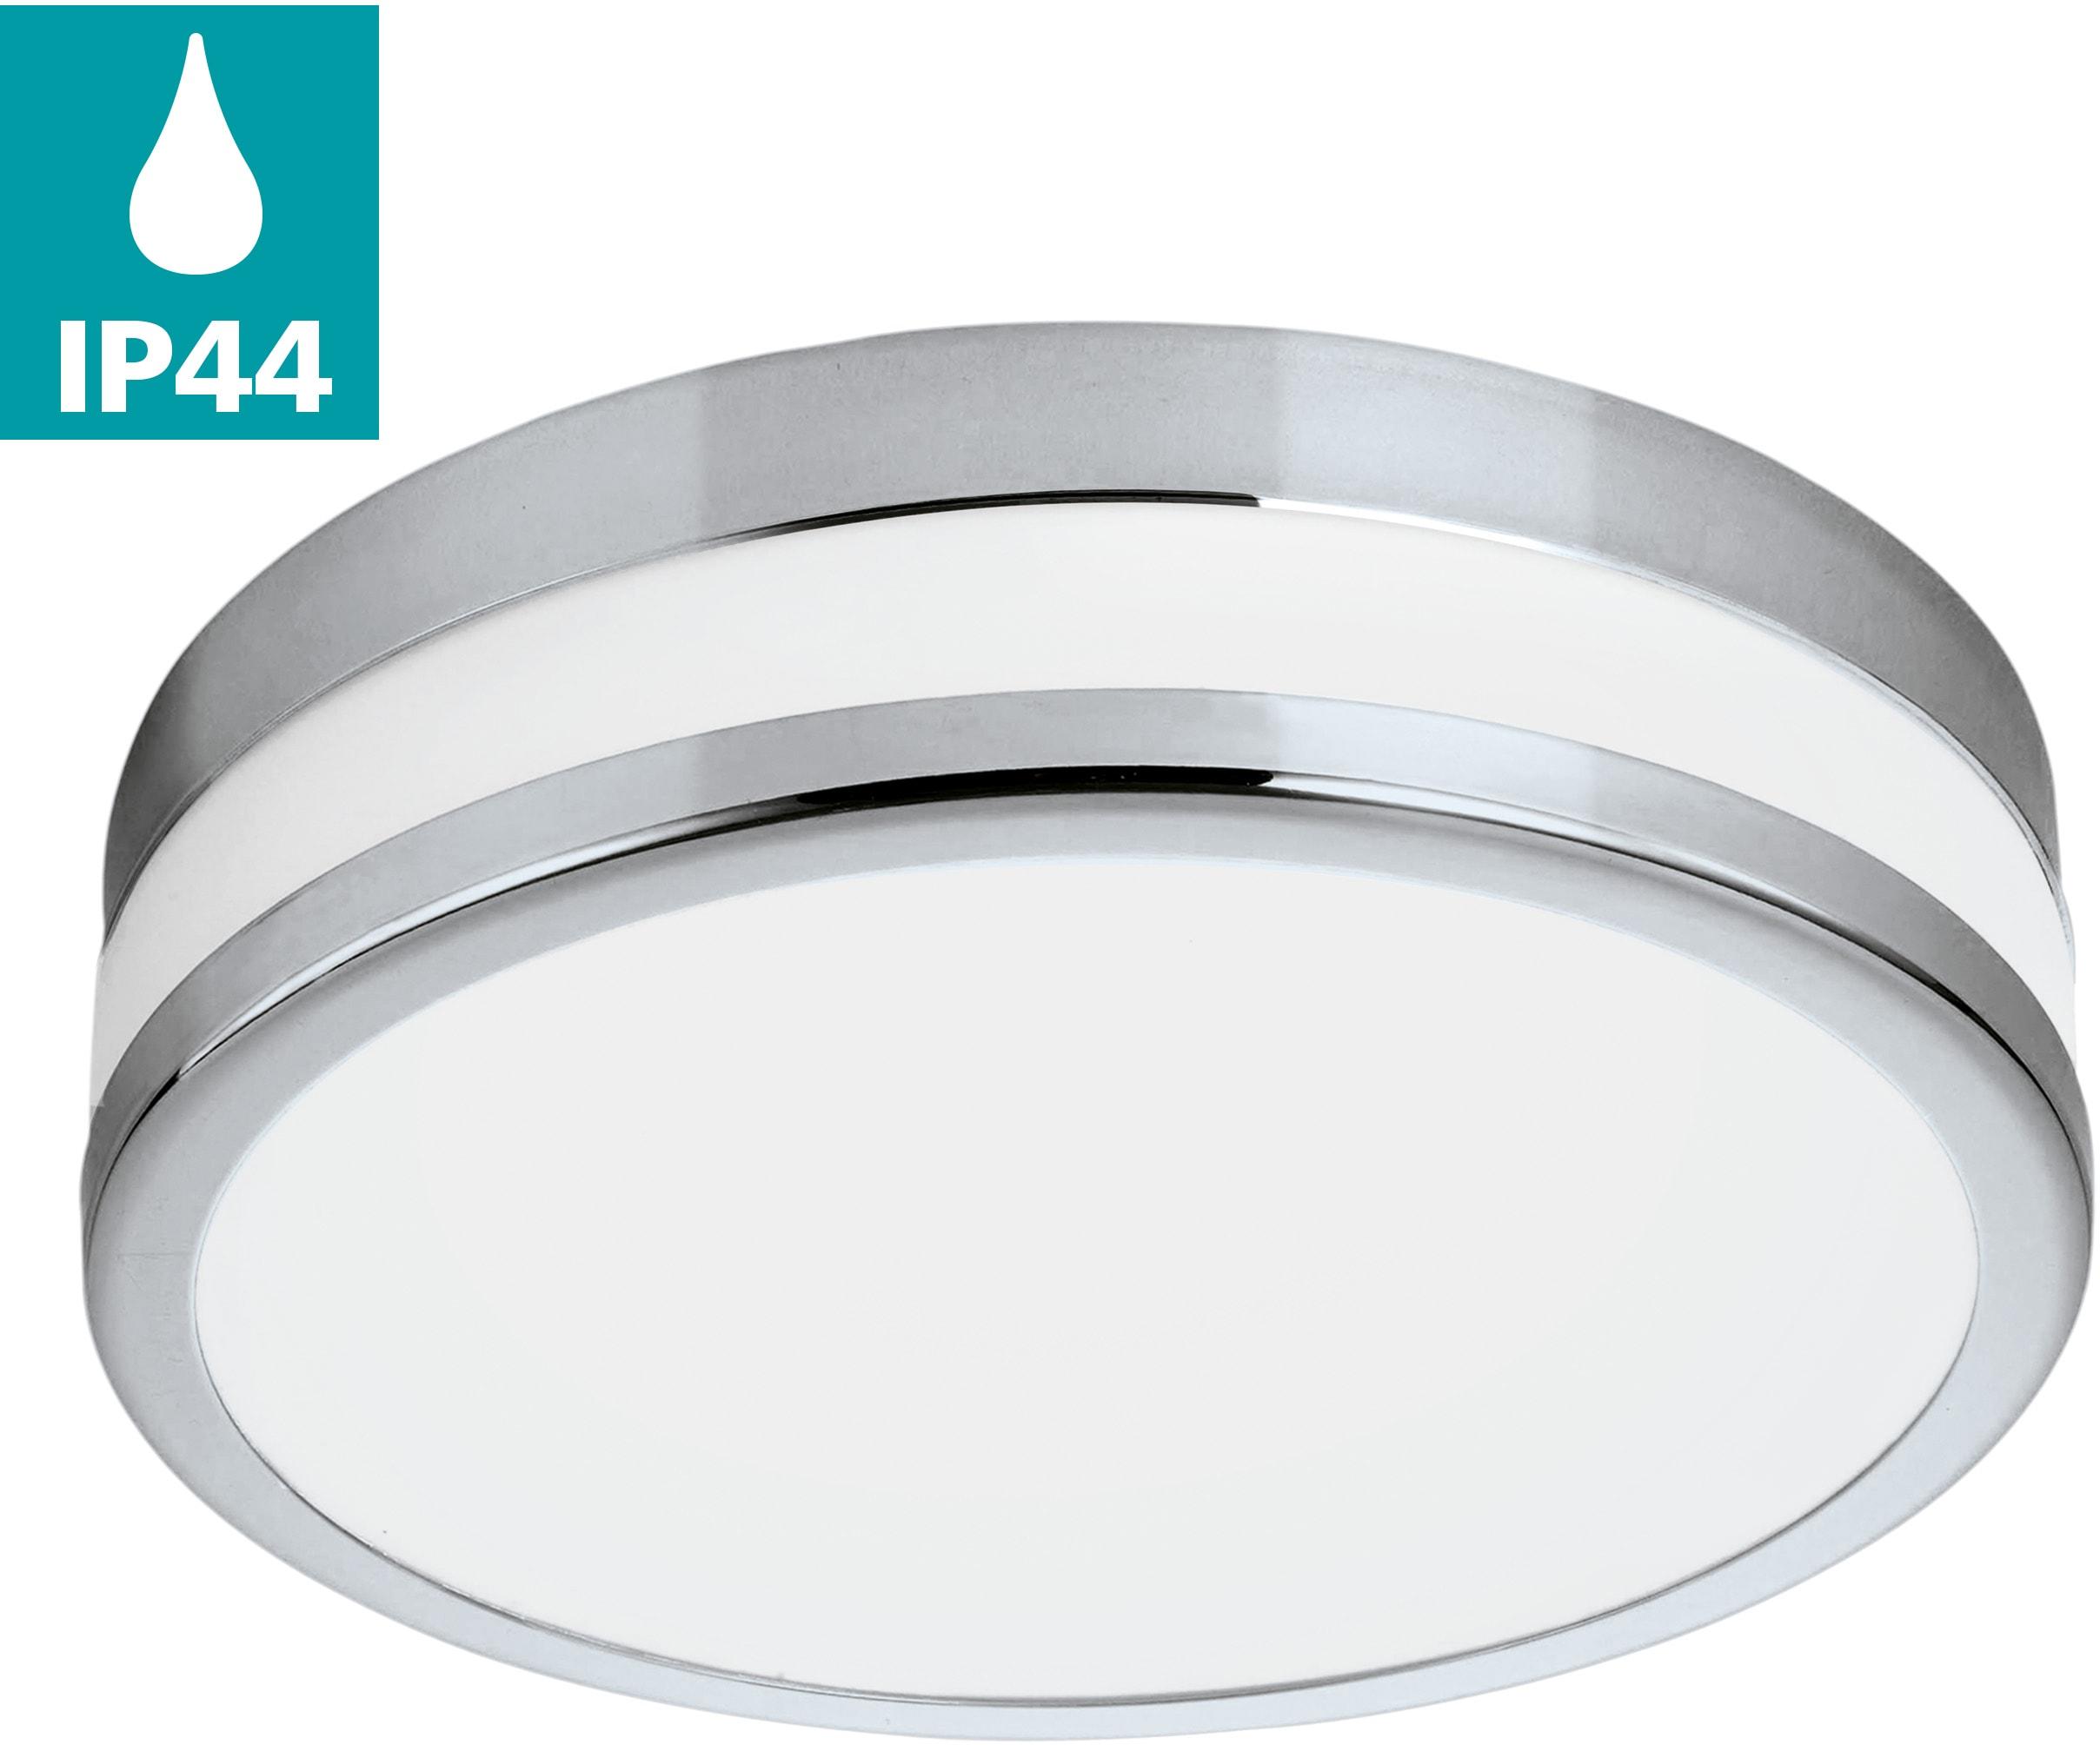 EGLO Deckenleuchte PALERMO, LED-Board, Warmweiß, LED fest integriert